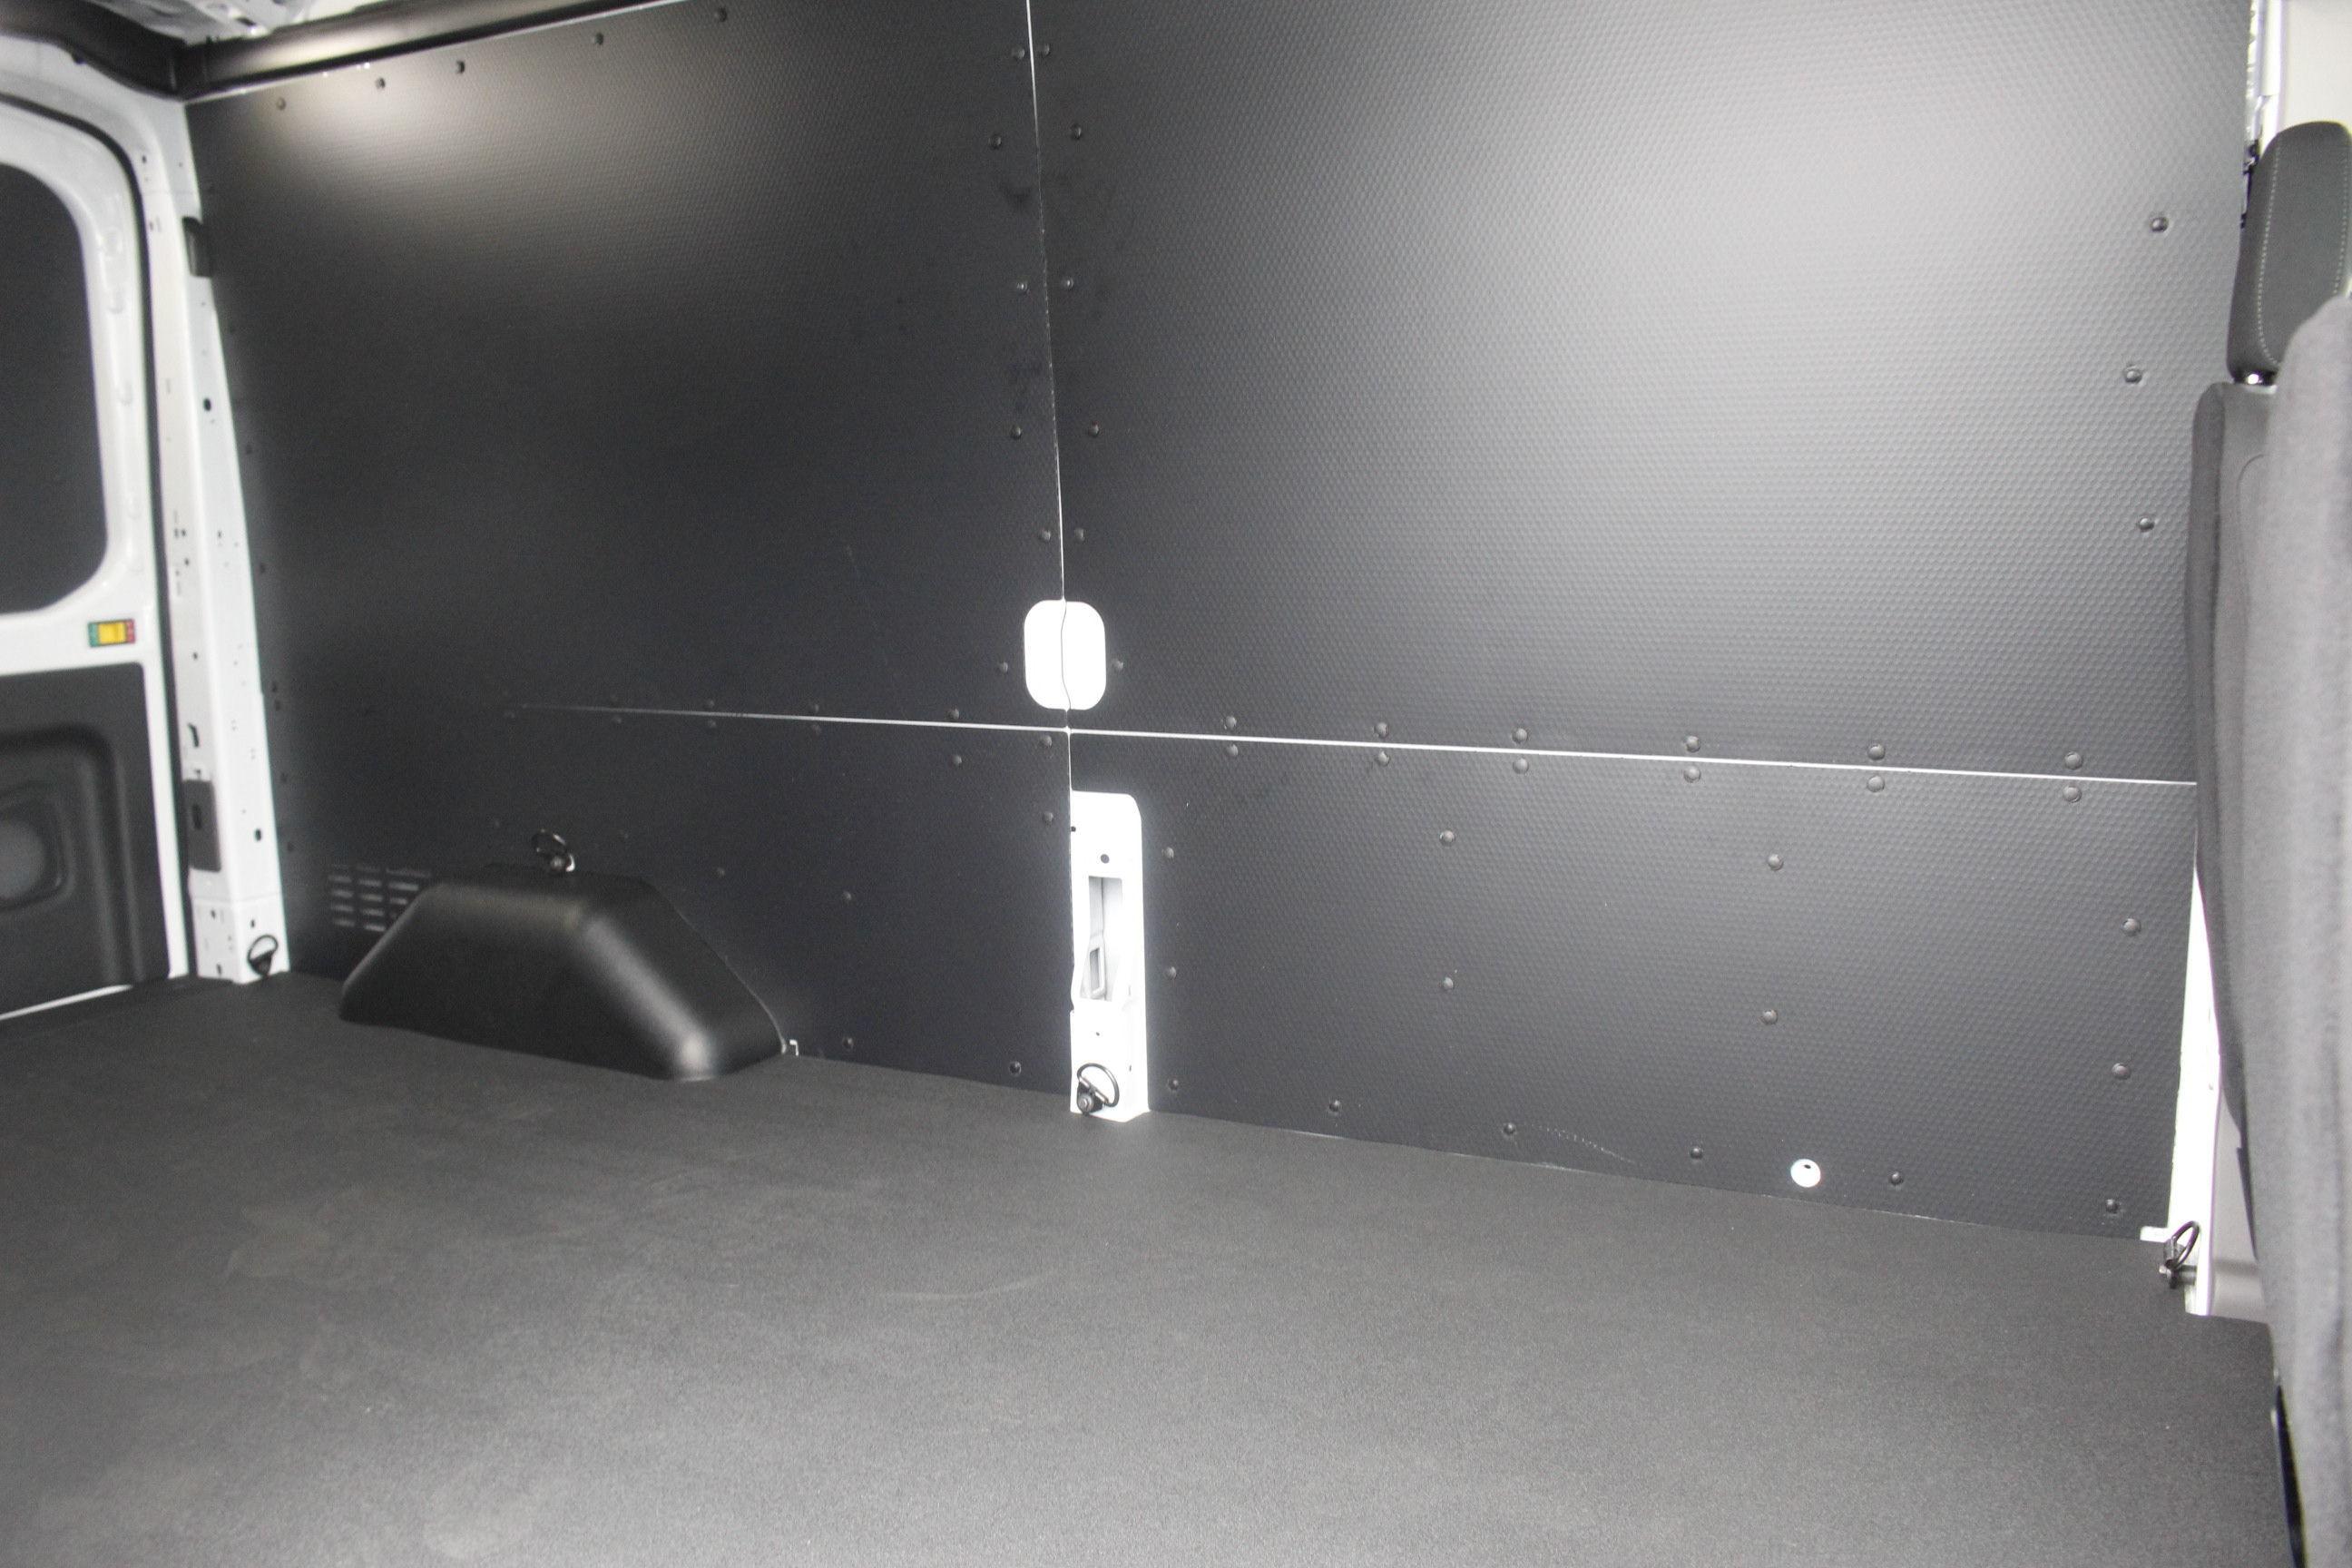 2020 Transit 250 Med Roof RWD, Empty Cargo Van #E9146 - photo 1